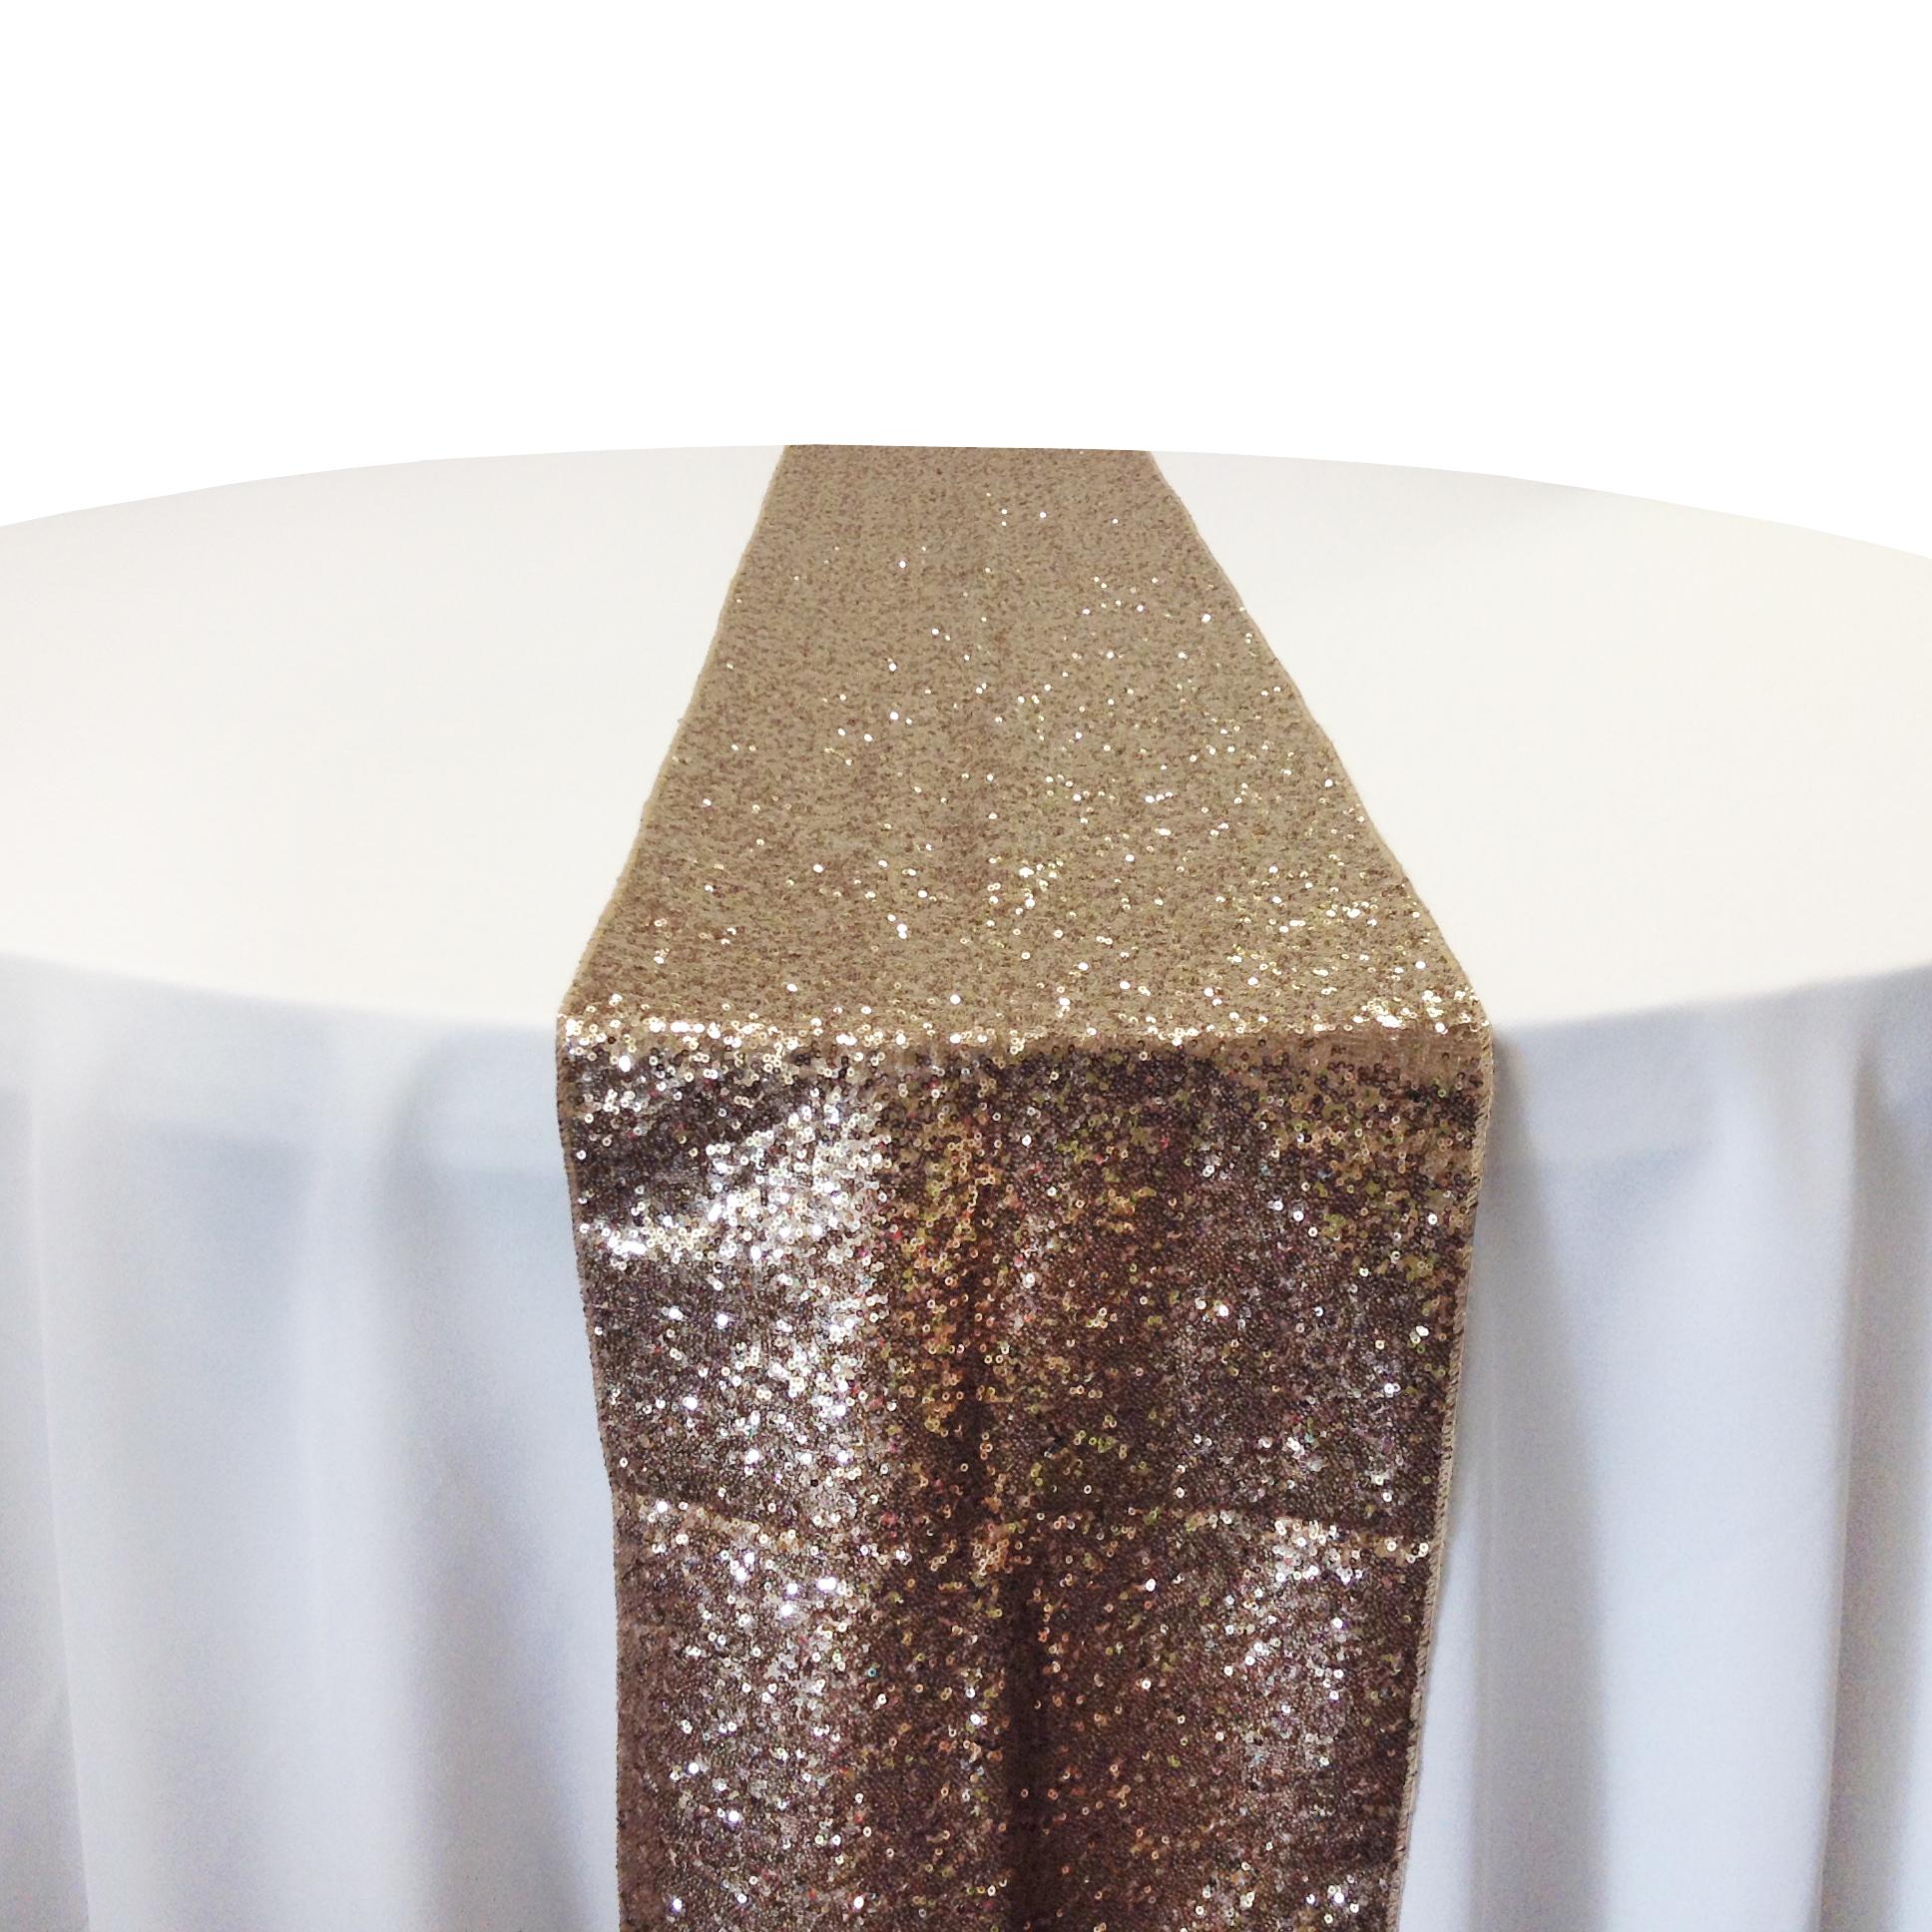 Champagne Taffeta Glitz Table Runner Rental Champagne Taffeta Glitz Table Runner Rental